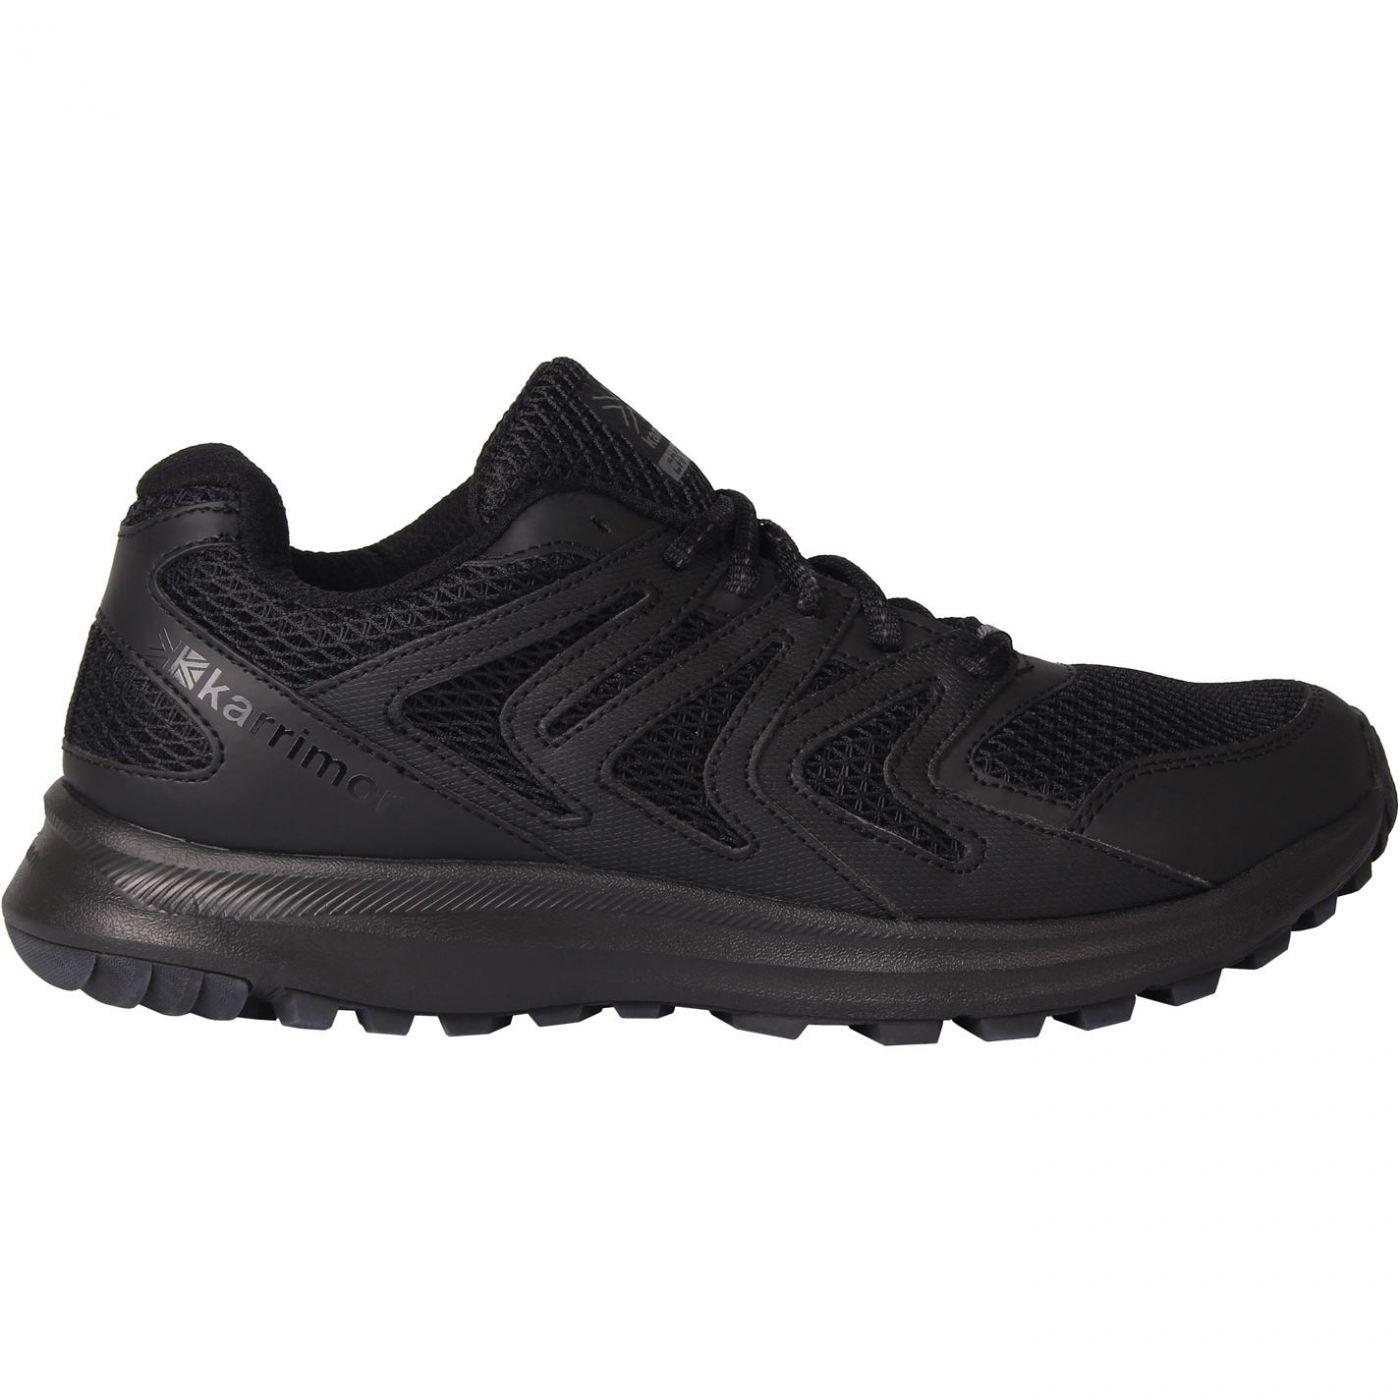 Karrimor Caracal Mens Trail Running Shoes